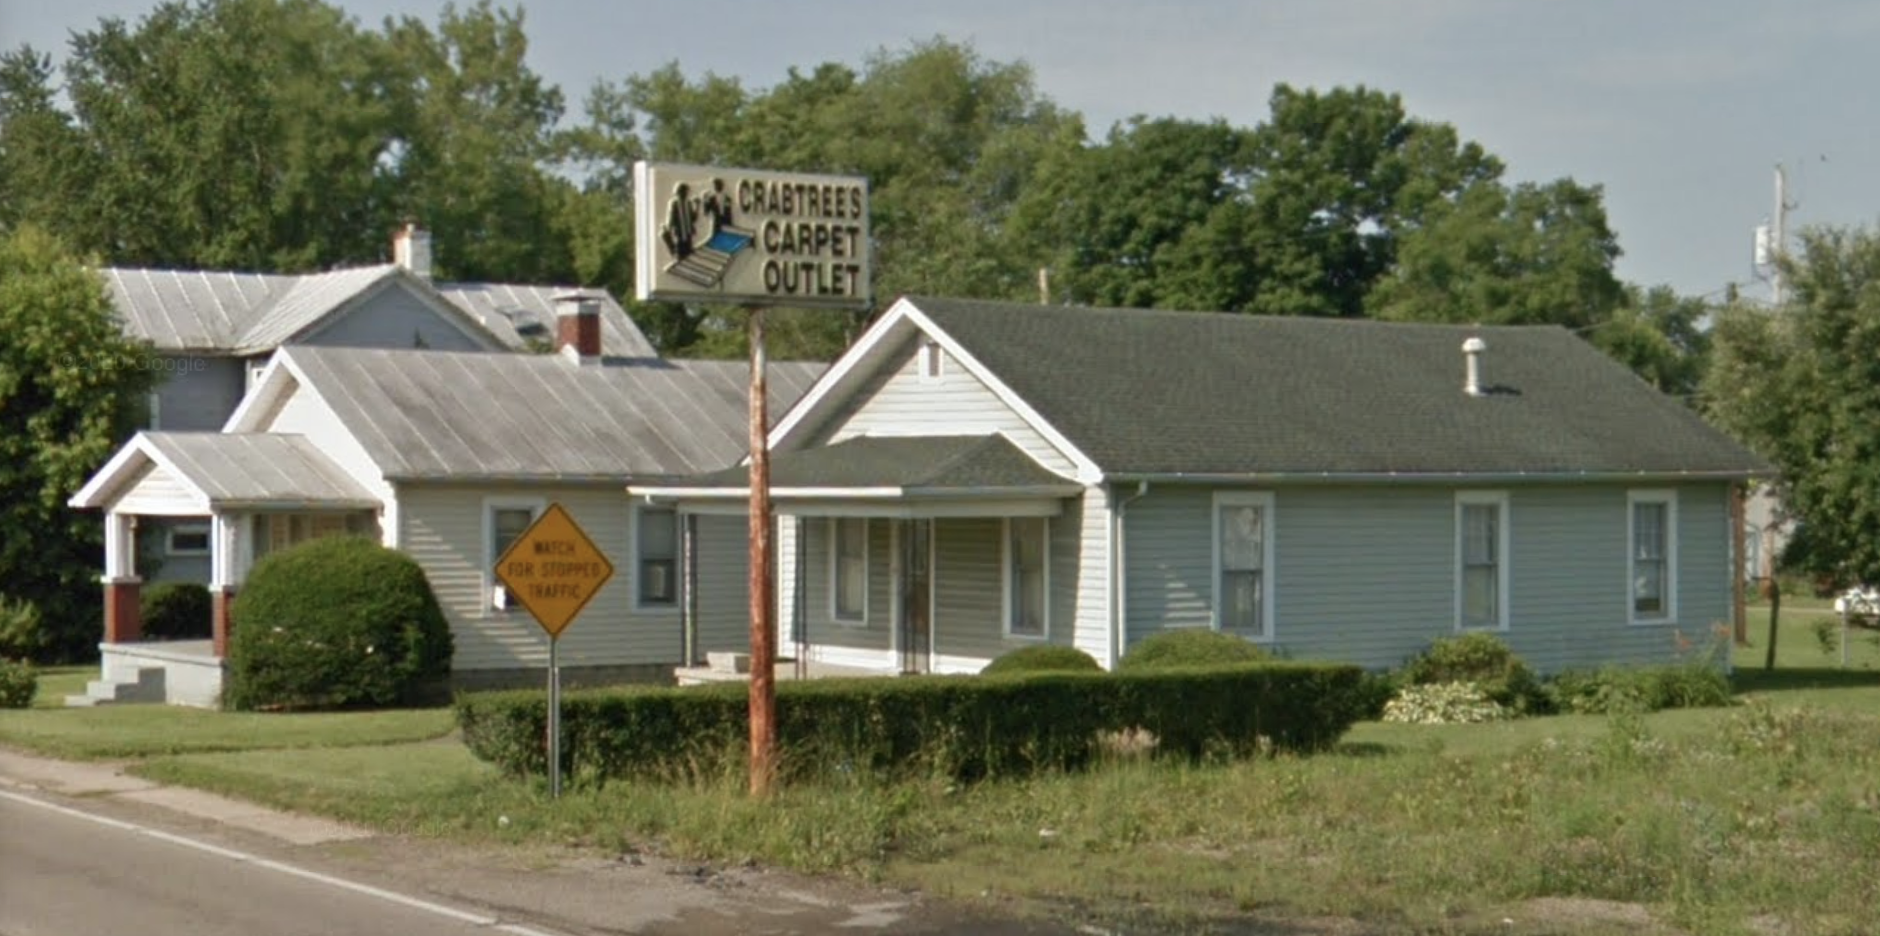 Crabtree's Carpet - 10837 US-23, Lucasville, OH 45648